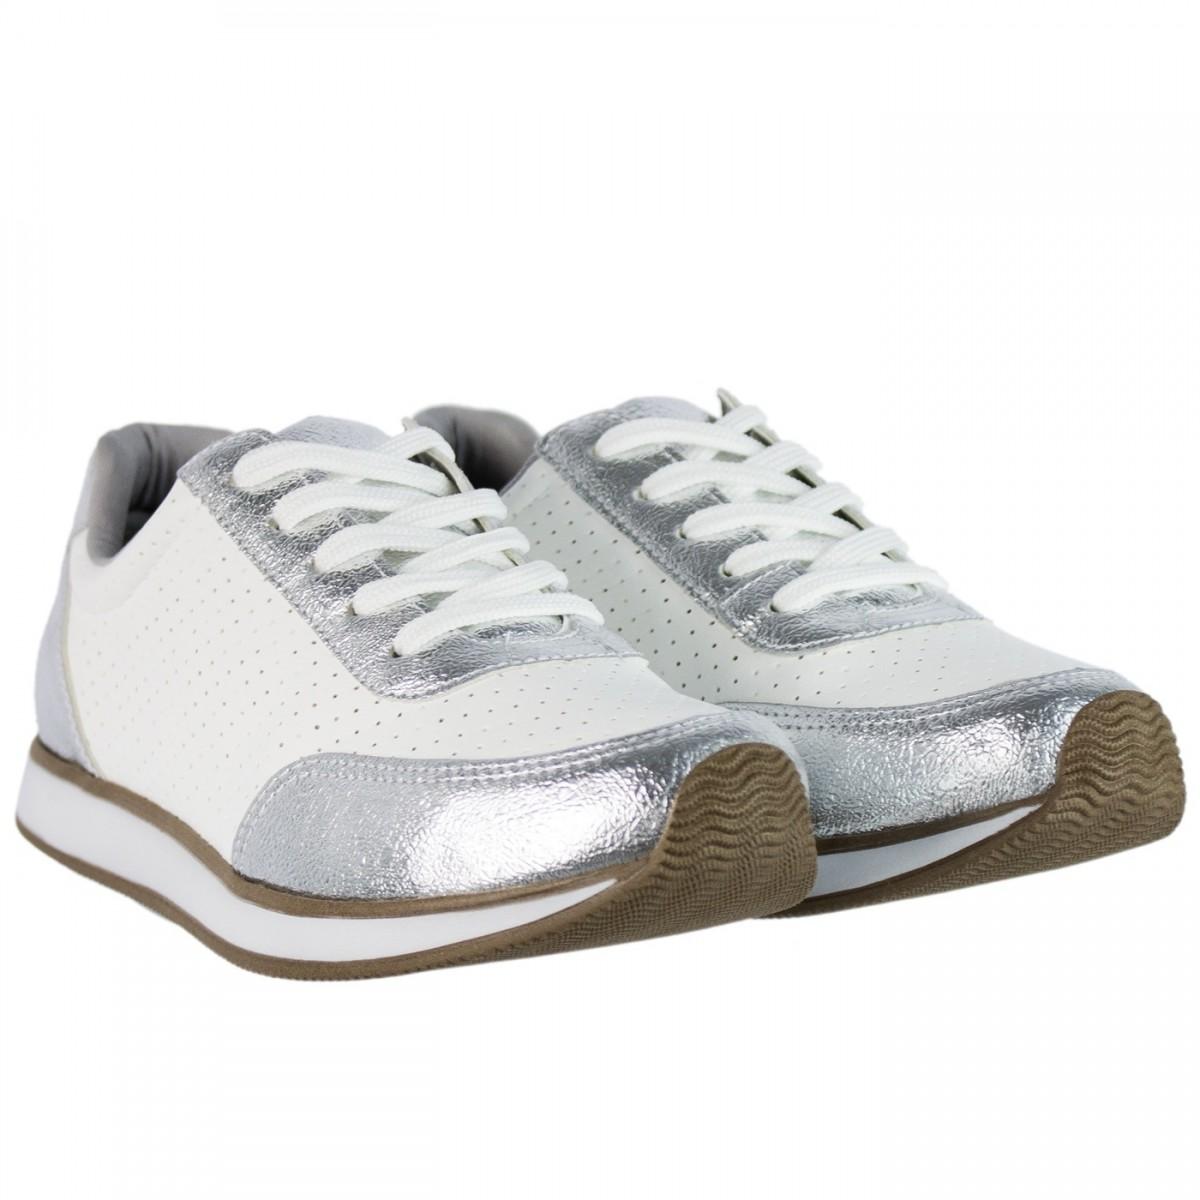 6132bb8c06 Bizz Store - Tênis Feminino Via Marte Napa New Metal Branco Couro